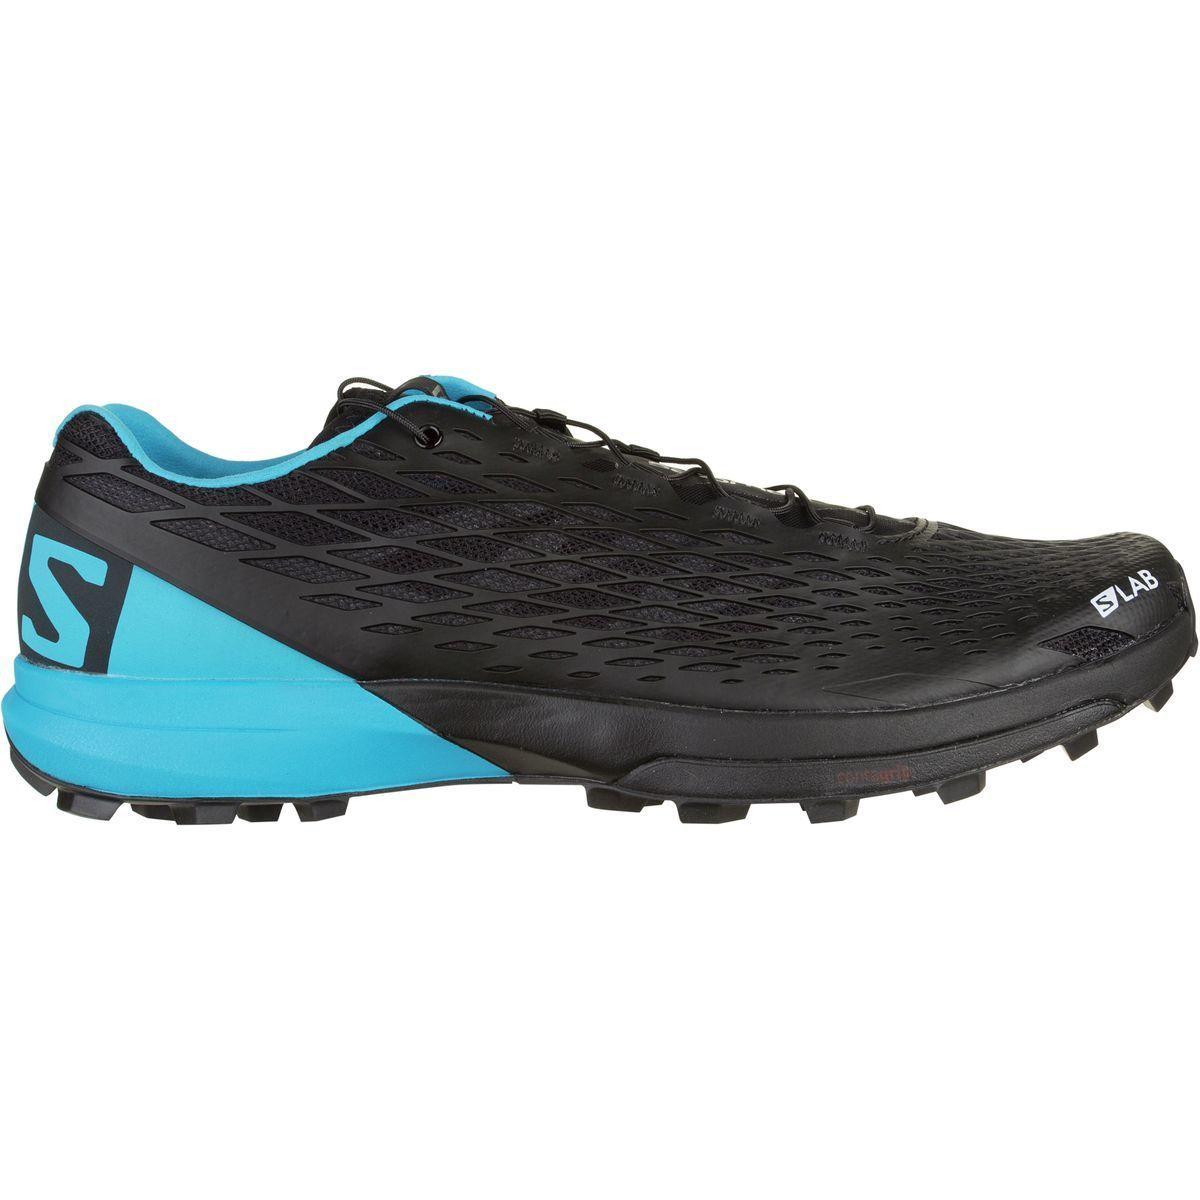 photo: Salomon S-Lab XA Amphib trail running shoe